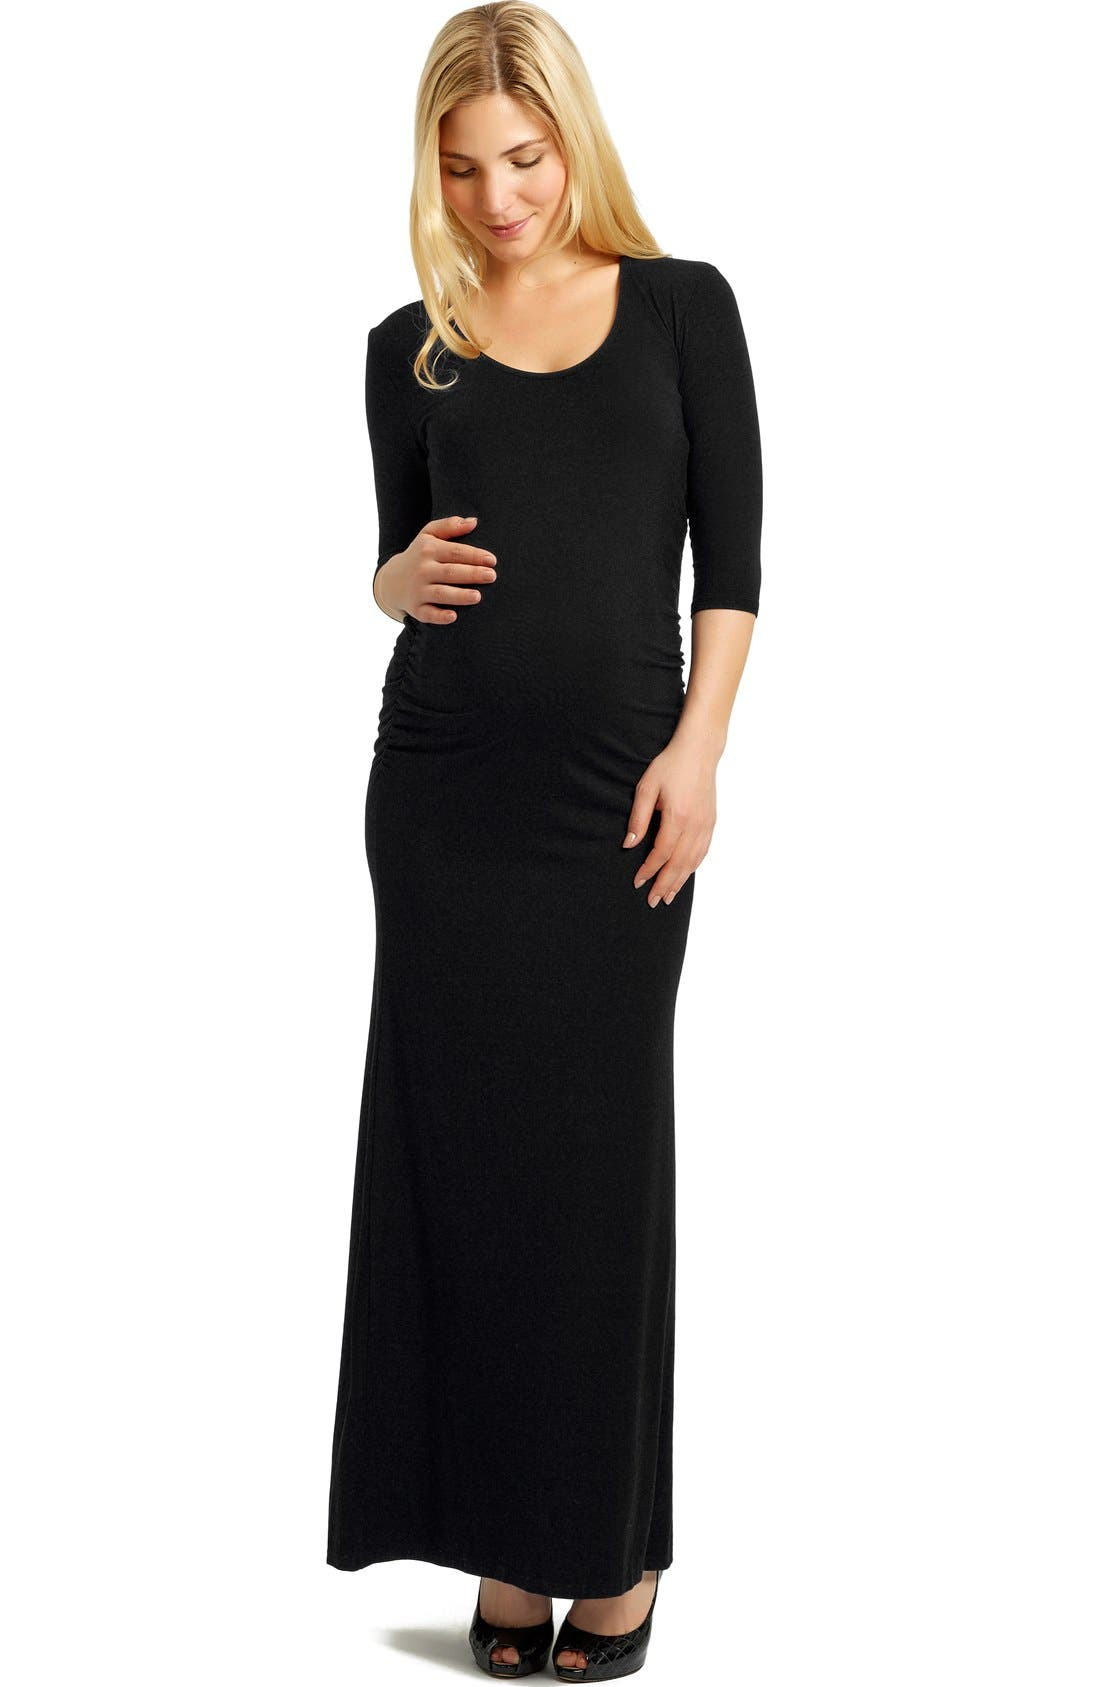 MaddersonLondon 'Saturday' Maternity Maxi Dress, Main, color, 001